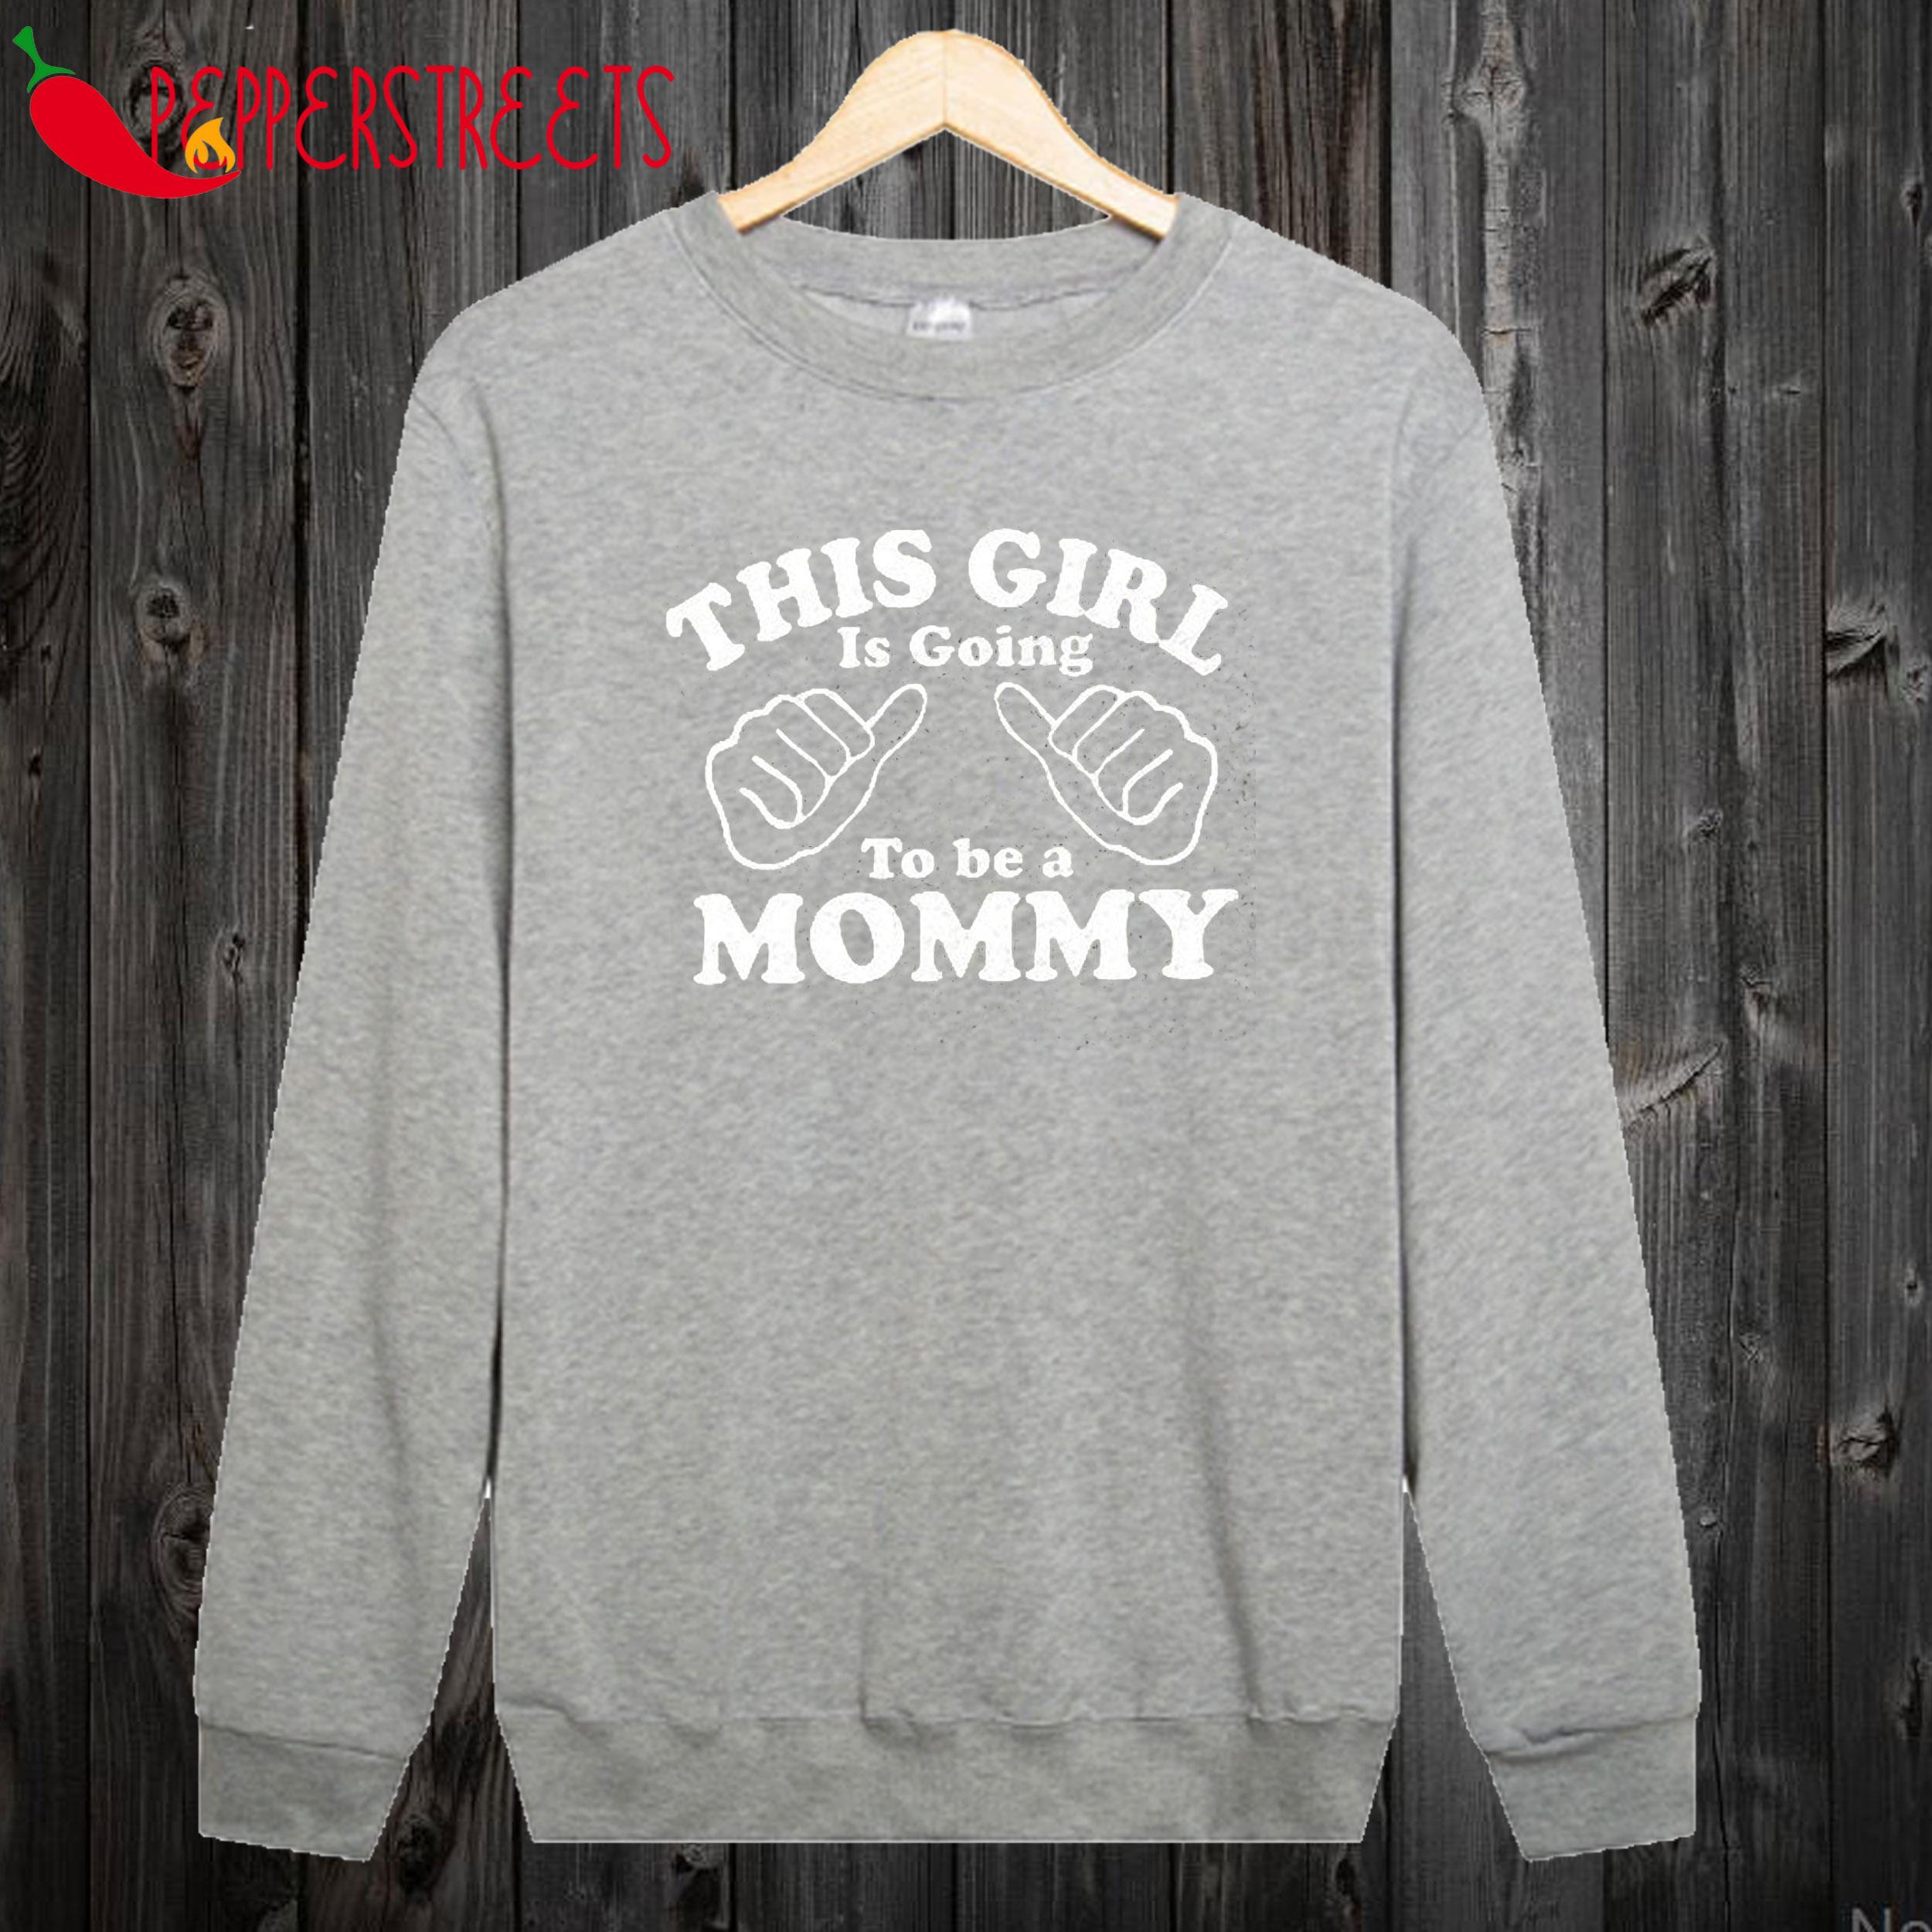 Baby Pregnancy Announcement Sweatshirt